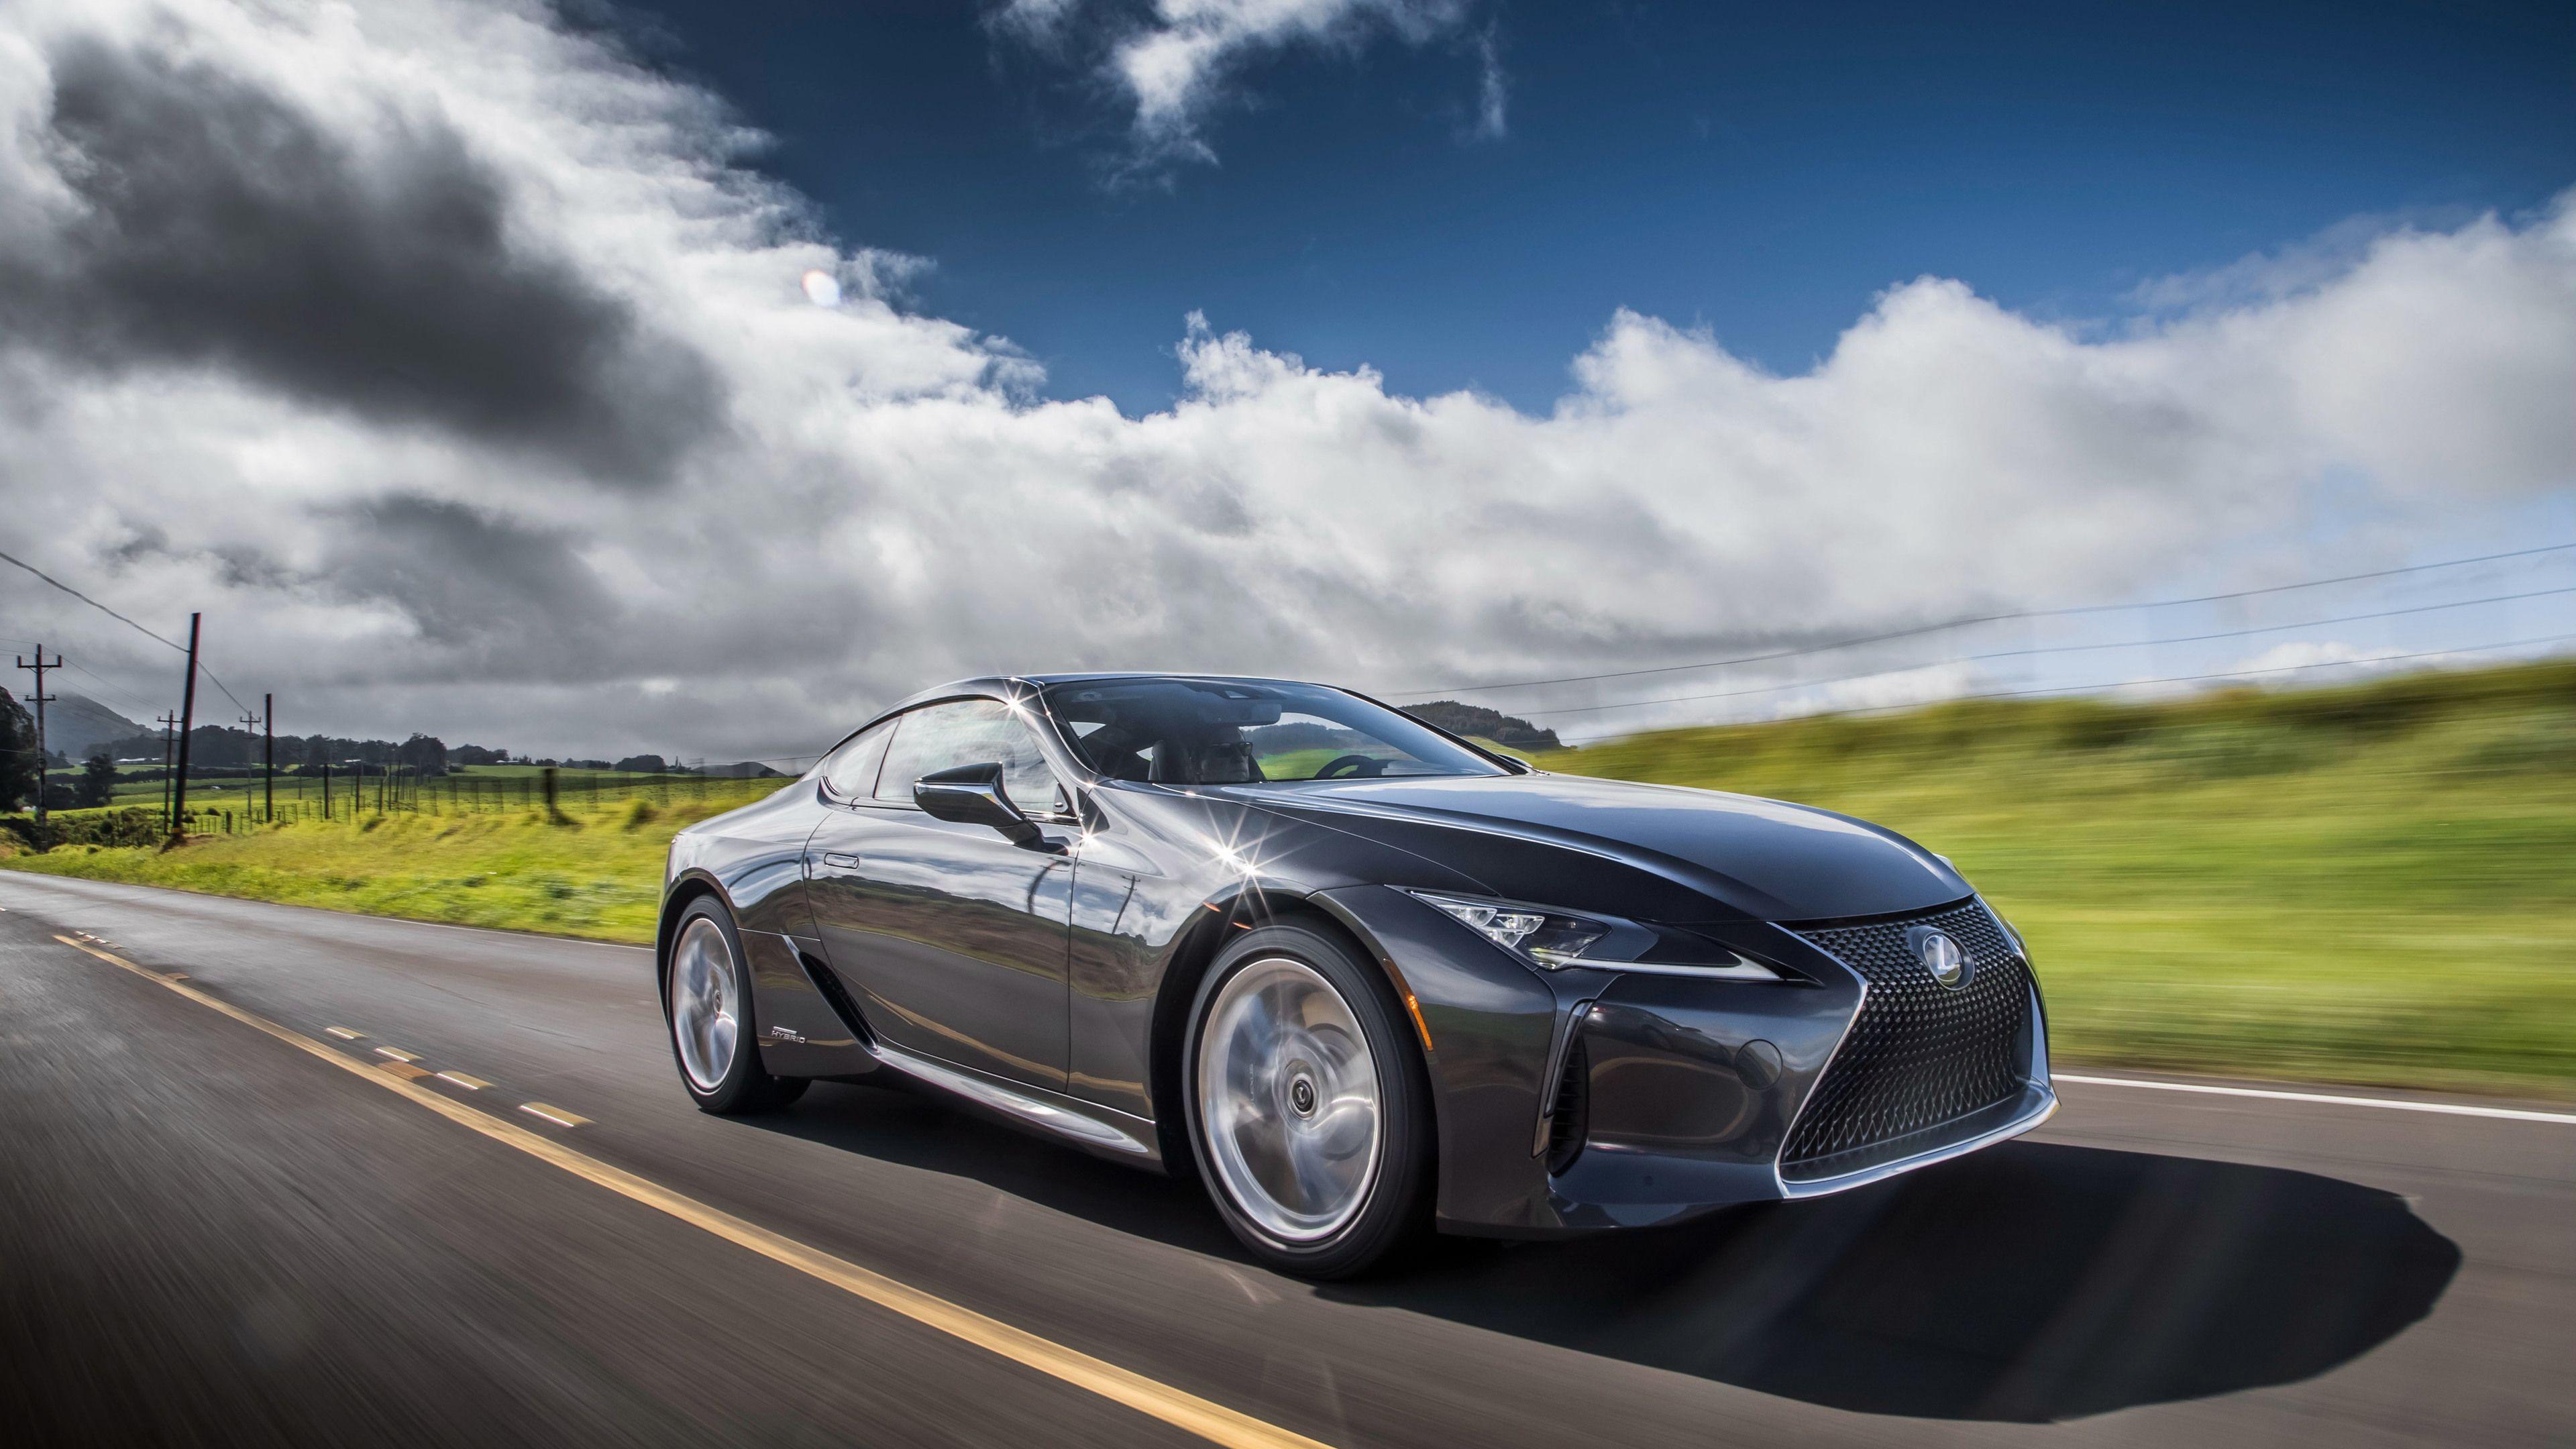 Lexus 4k Wallpapers Top Free Lexus 4k Backgrounds Wallpaperaccess